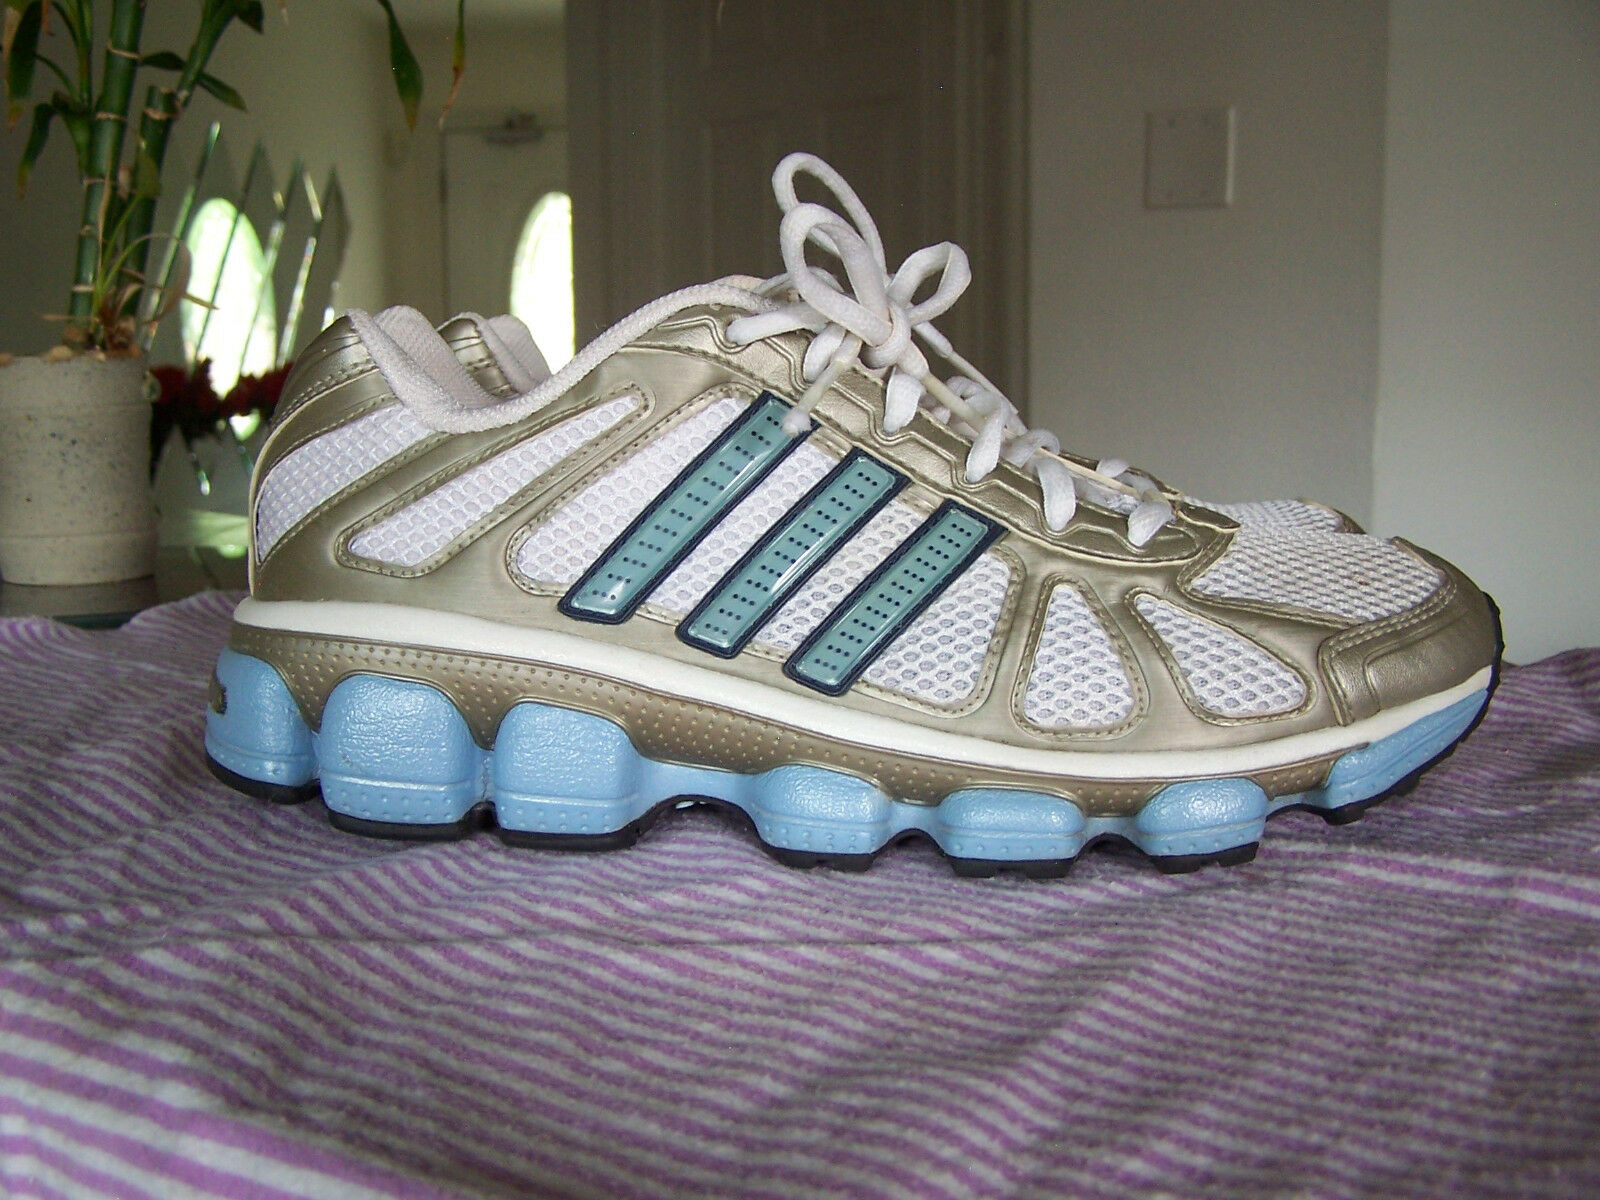 ADIDAS Homme 3D ADIPRENE Cushion Running Chaussures